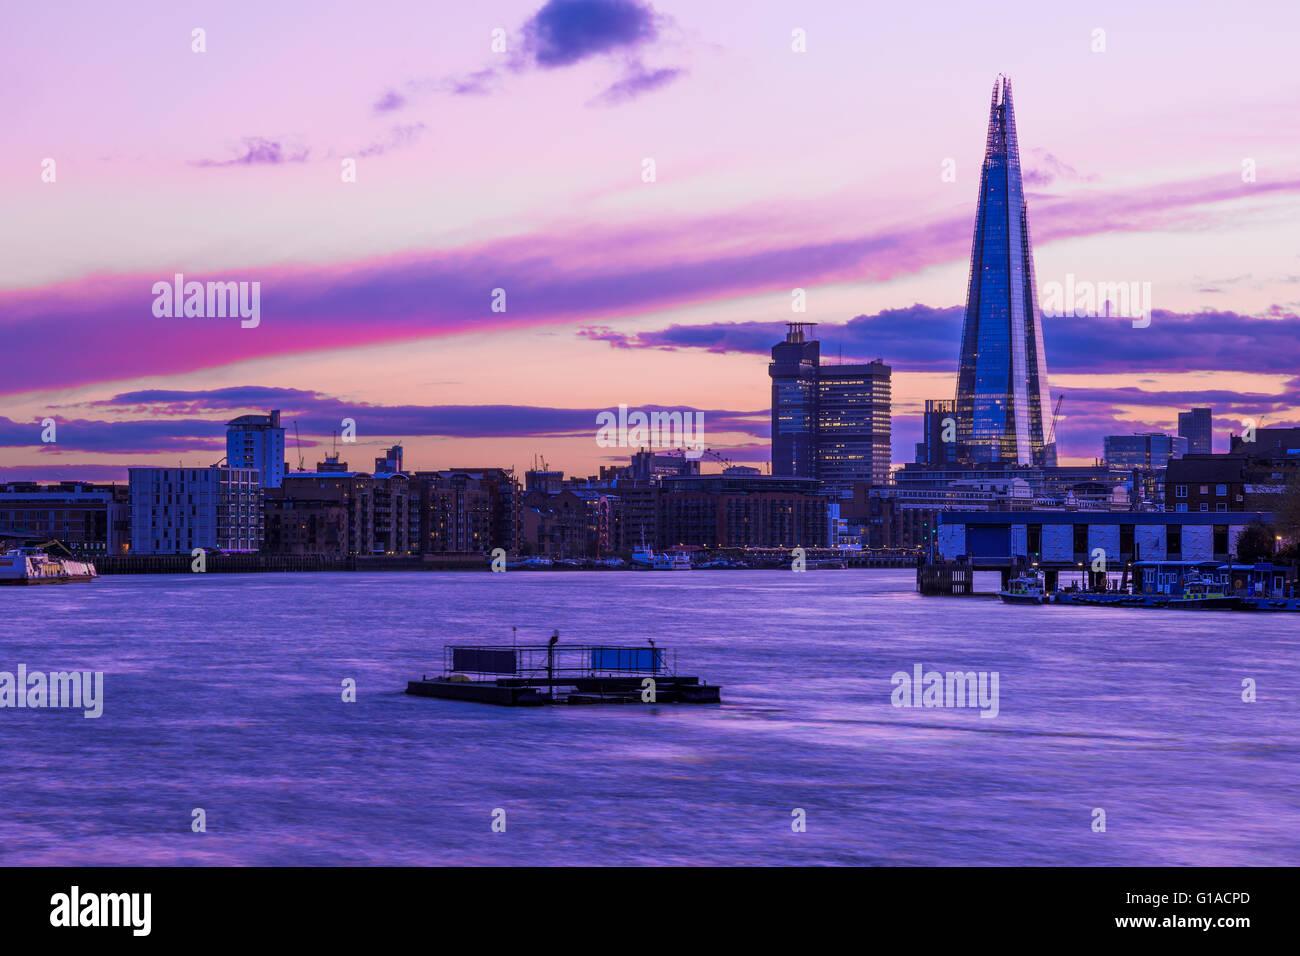 Modernen Londoner Stadtbild während des Sonnenuntergangs, einschließlich The Shard Stockbild